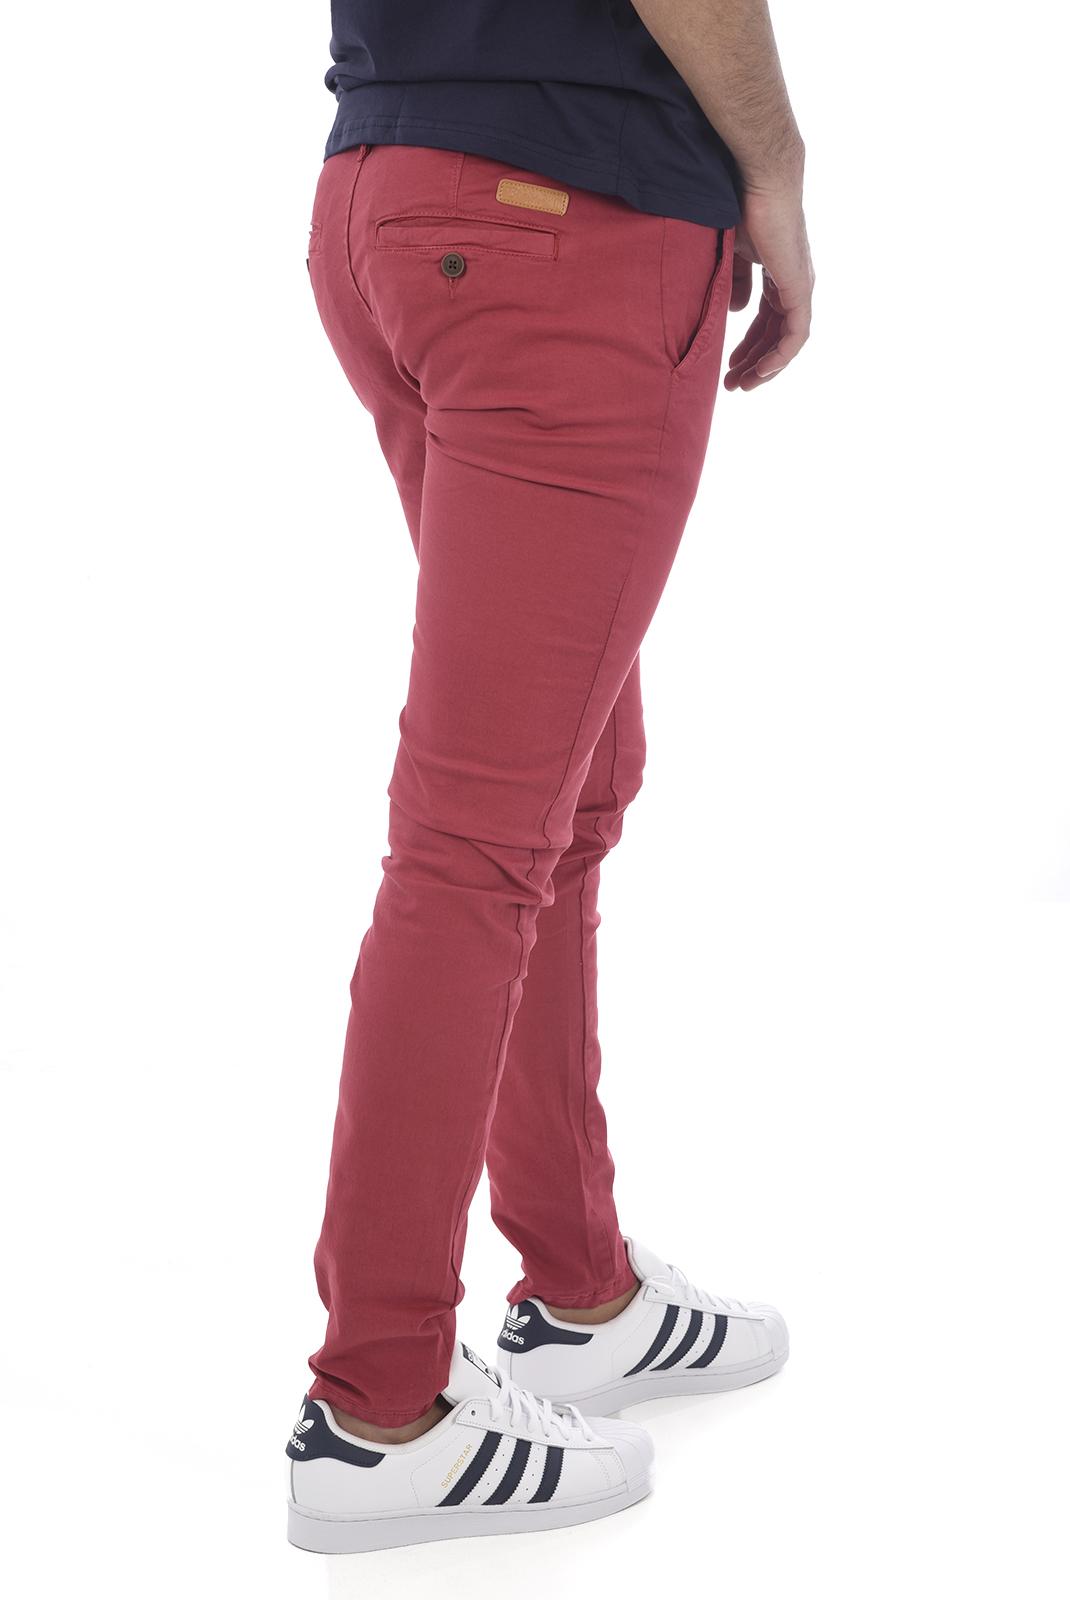 Pantalons chino/citadin  Backlight ALLEN RASPBERRY